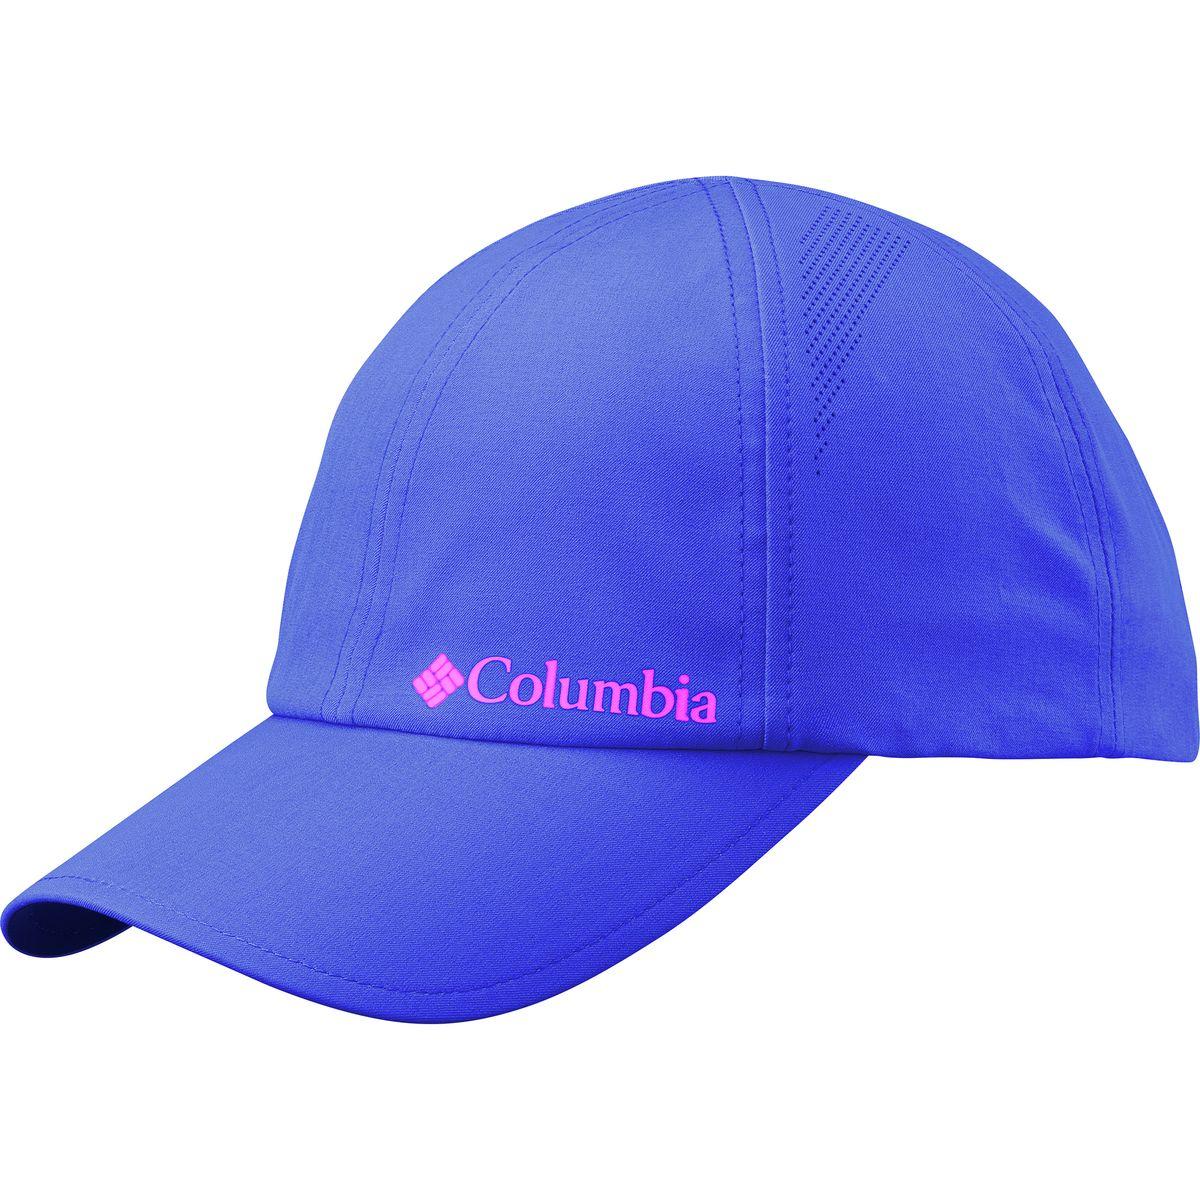 pictures Top 20 Best Tactical Hats For Men – Masculine Outdoor Apparel